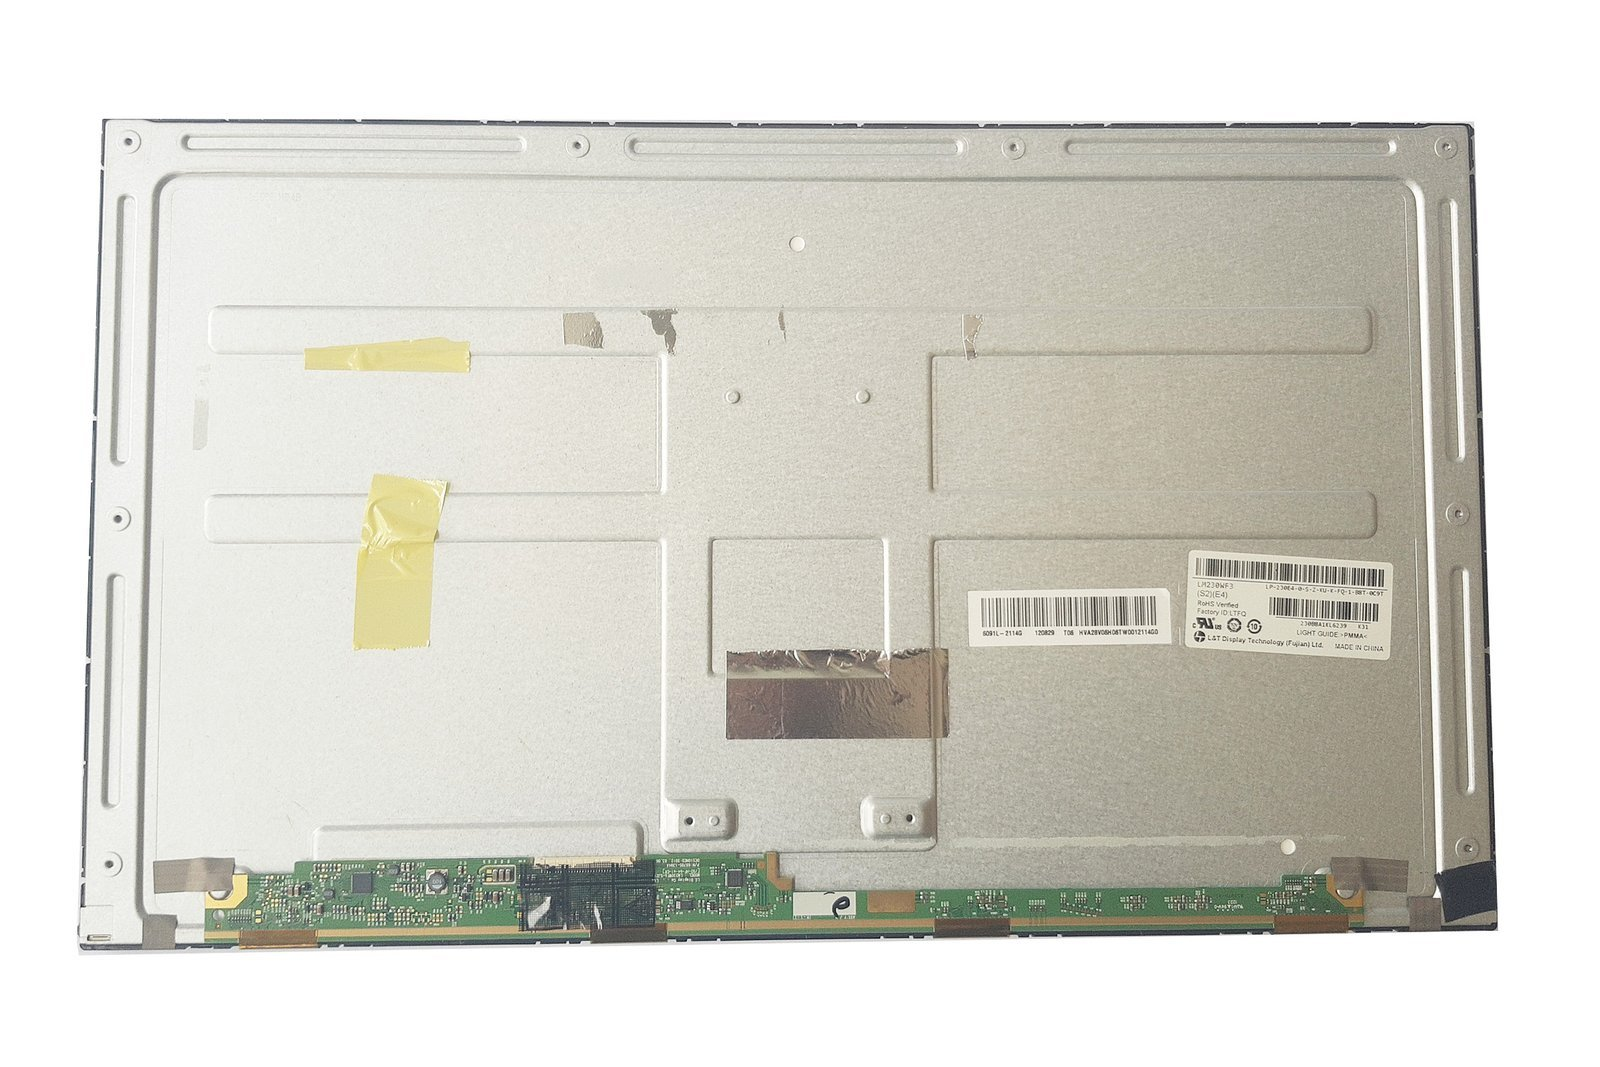 Display Panel Screen LG Display 23' LM230WF3-S2E4 1920x1080